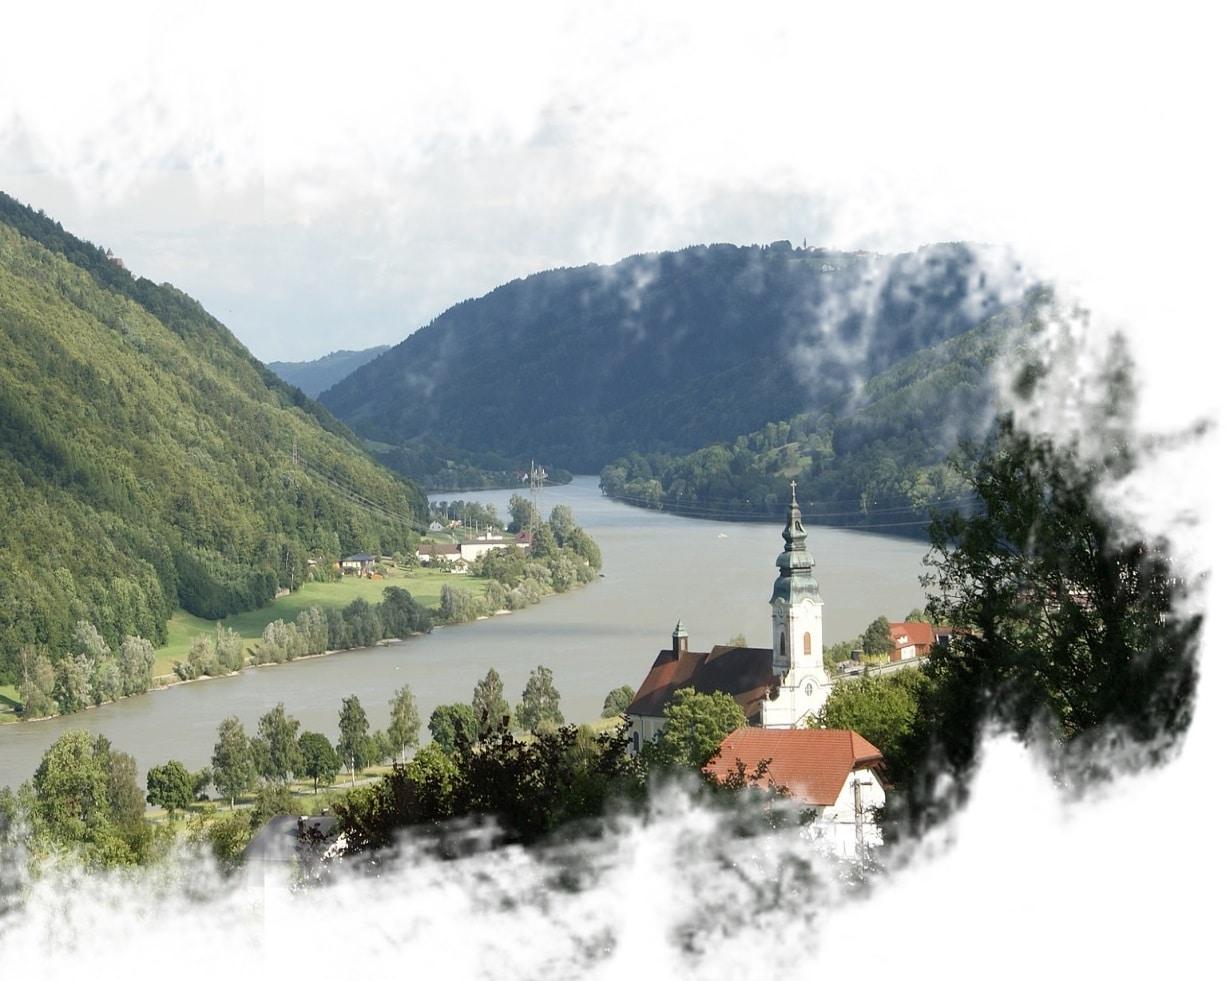 Cidade de Engelhartszell